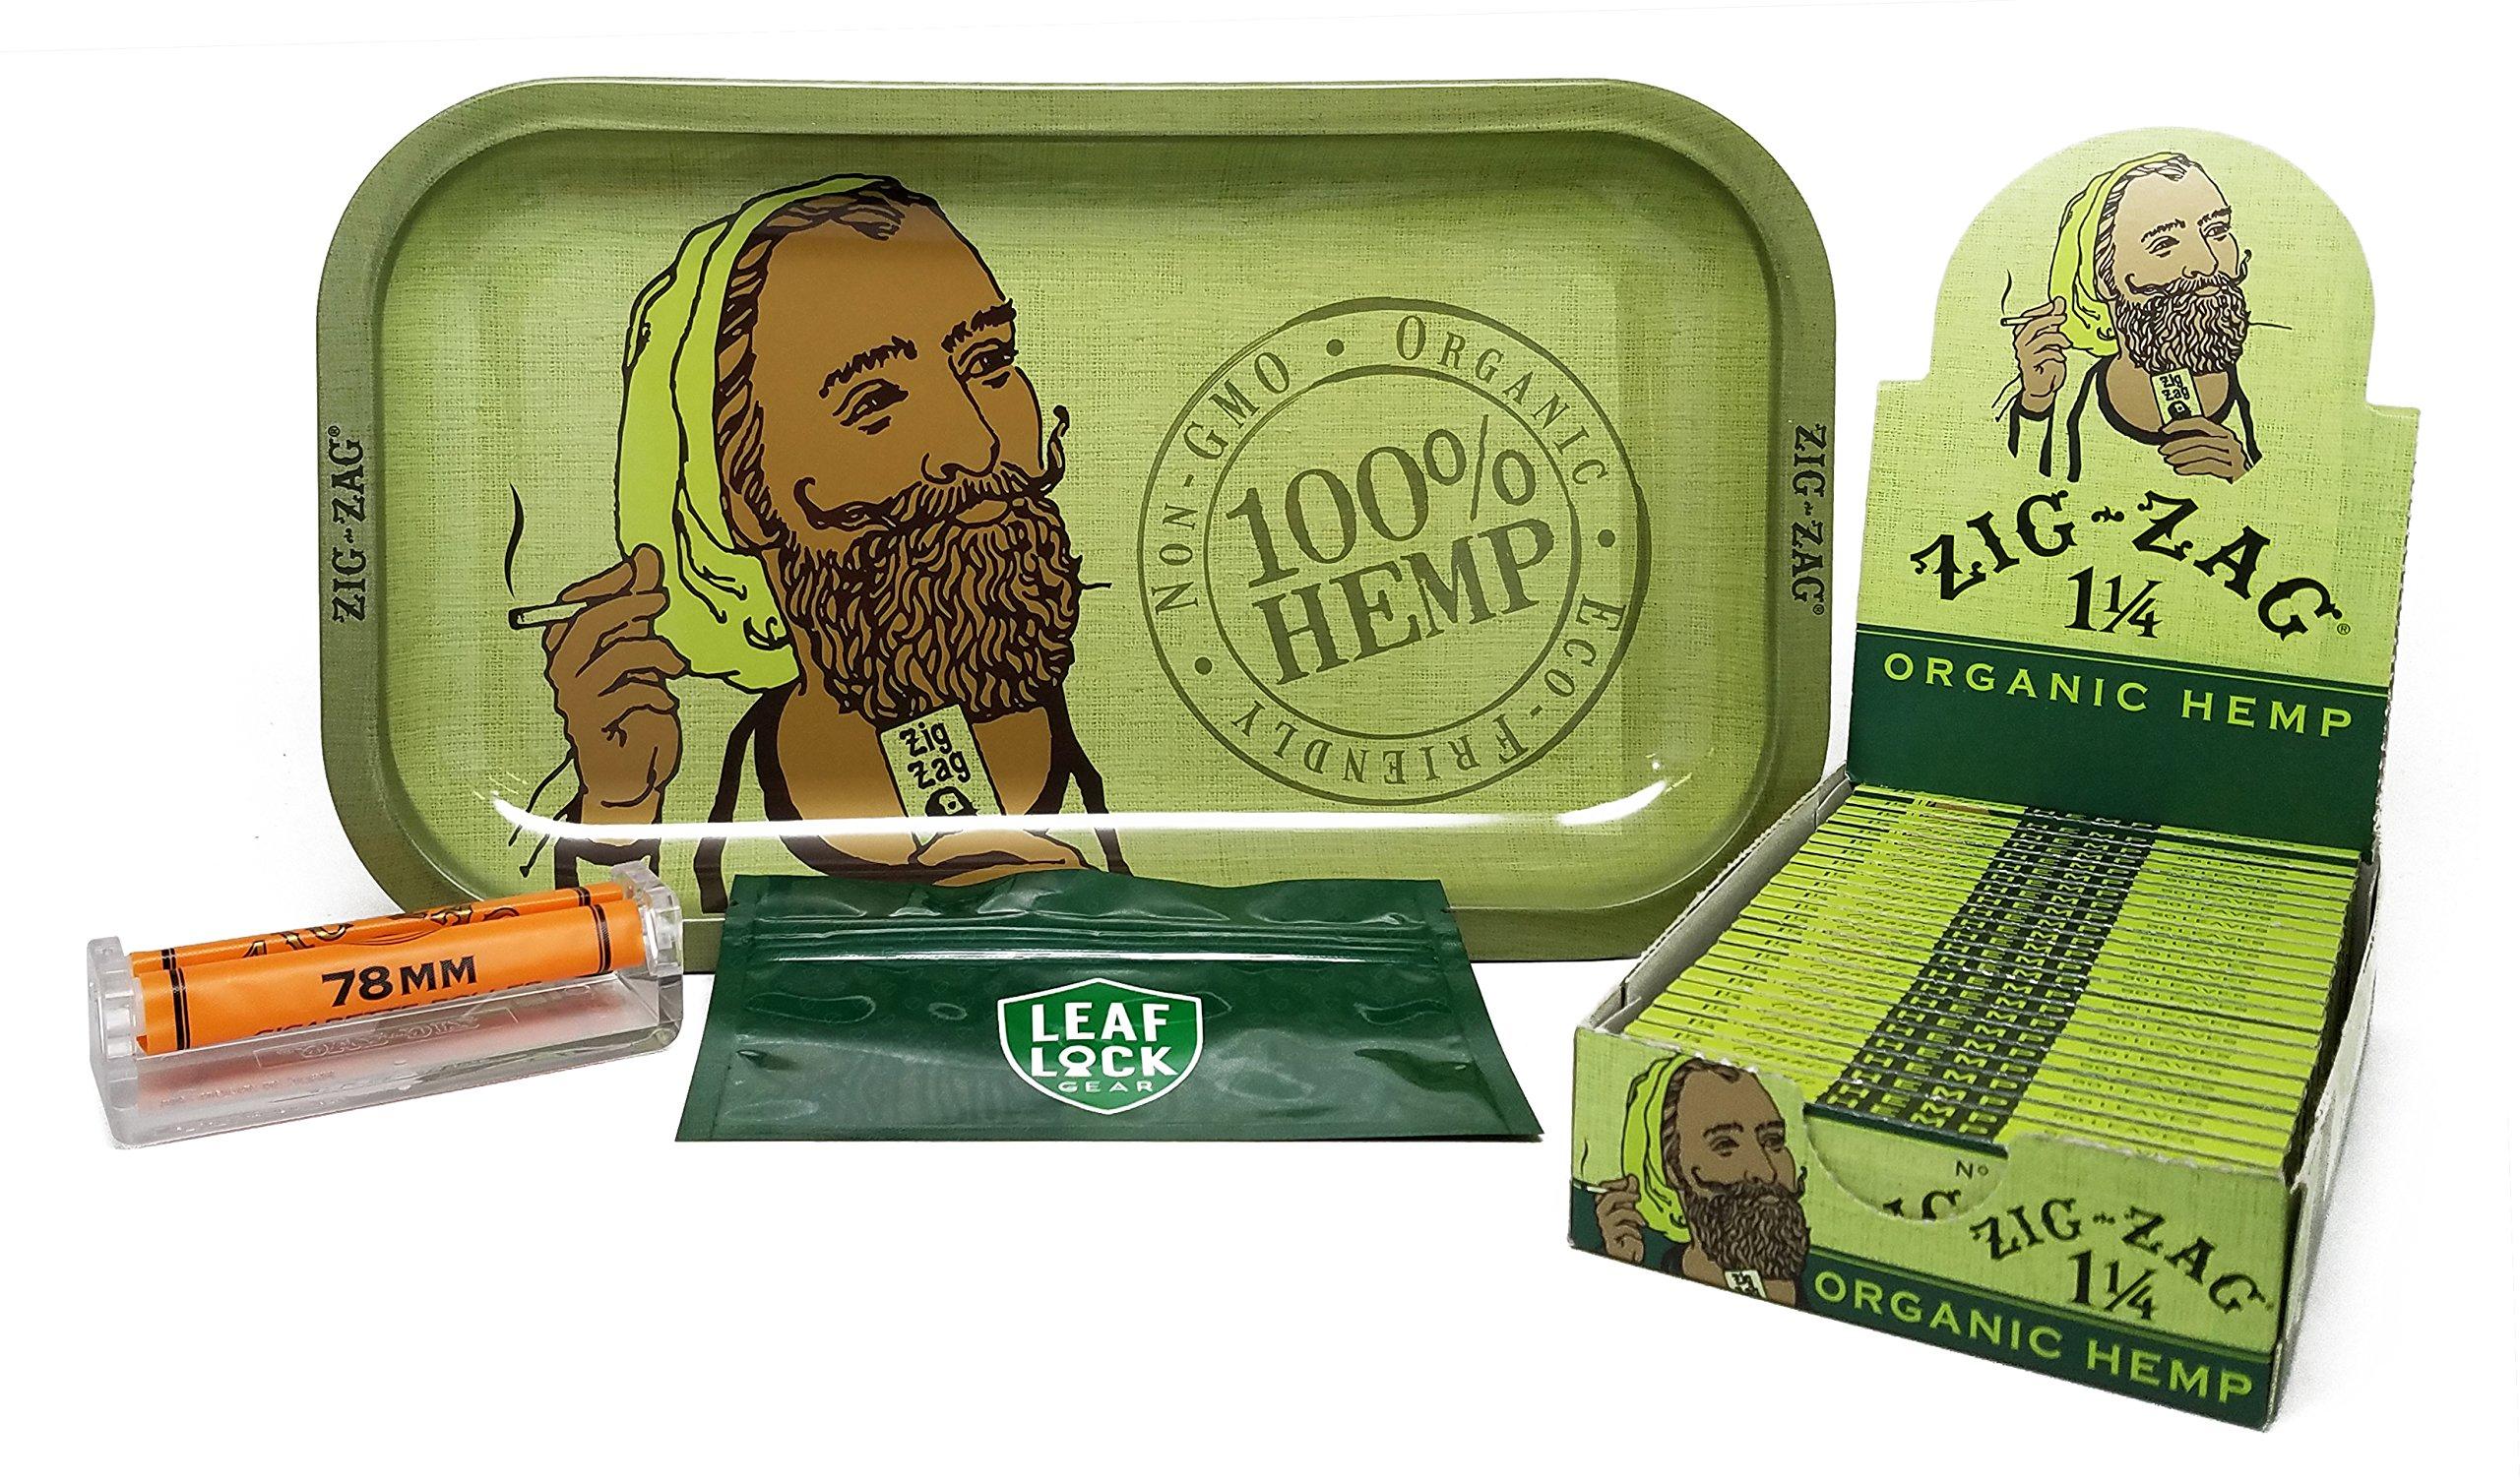 Zig Zag Organic Hemp Rolling Tray, Zig Zag Hemp 1 1/4 Rolling Papers (Full Box/24 Packs), Zig Zag Cigarette Maker and Leaf Lock Gear Smell Proof Tobacco Pouch